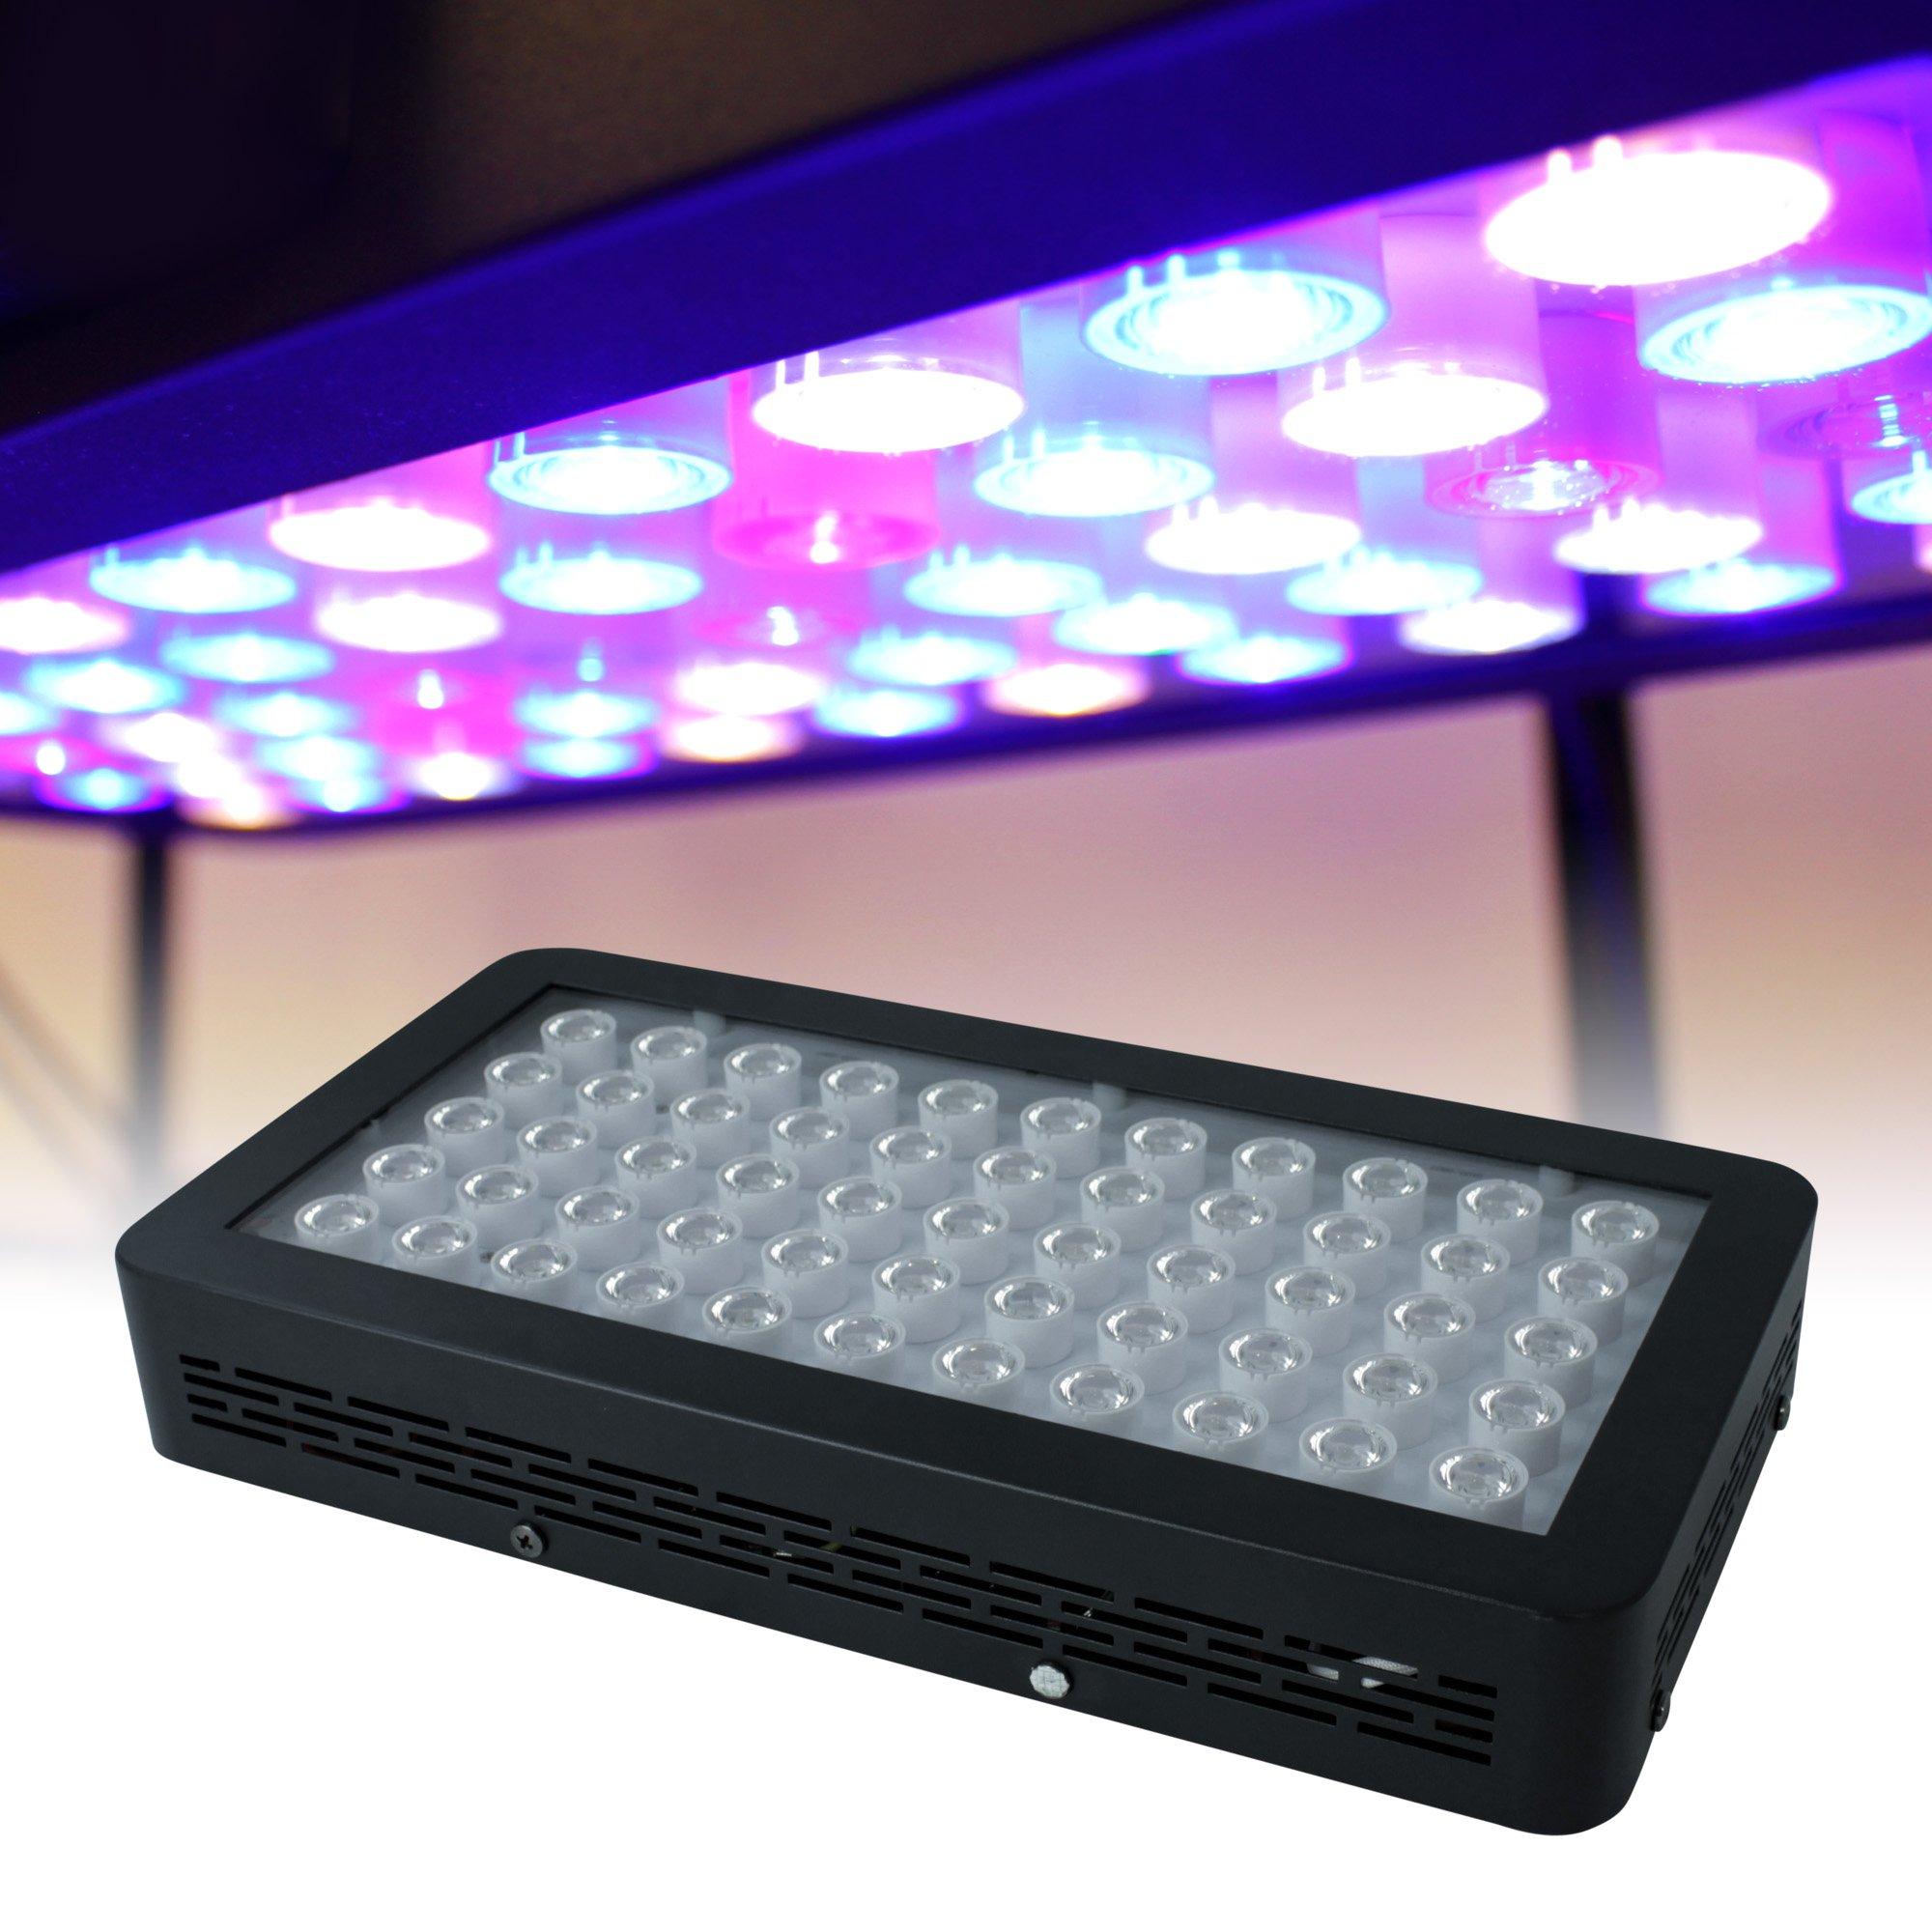 Hobbie Bug LED Aquarium Light Fixture for Saltwater/Coral Tanks – Euphotica Dimmable 16″, Programmable 16″ / 24″ / 32″